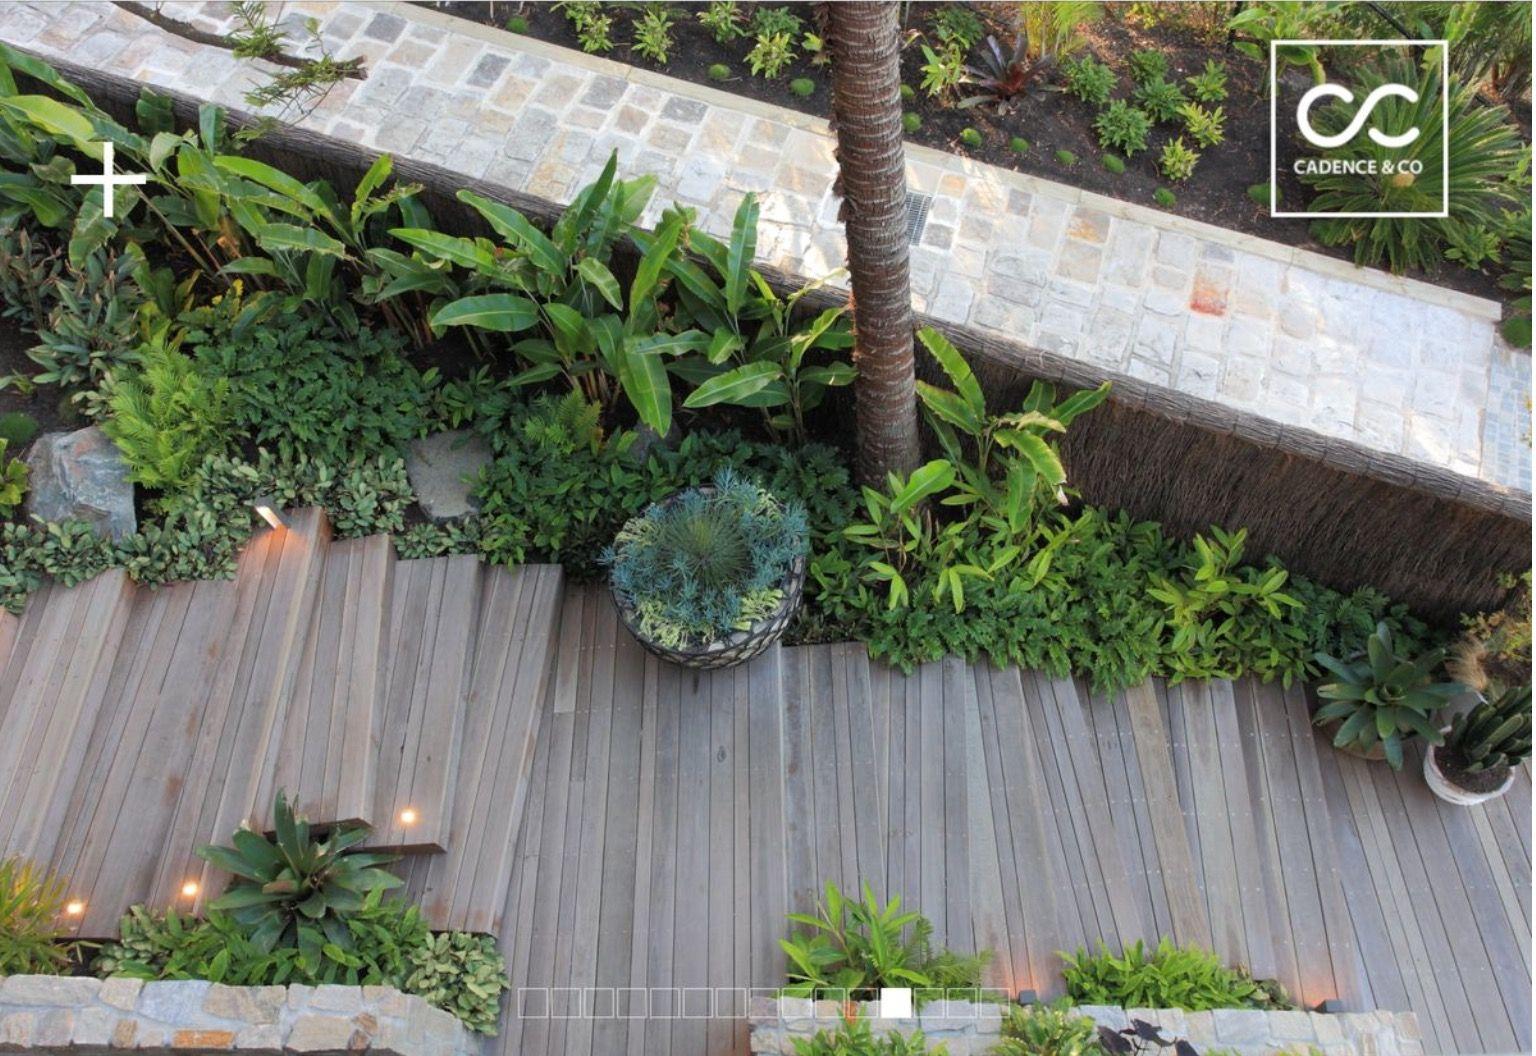 Sticks and Stones Landscape Design - Sticks And Stones Landscape Design Garden Pinterest Landscape